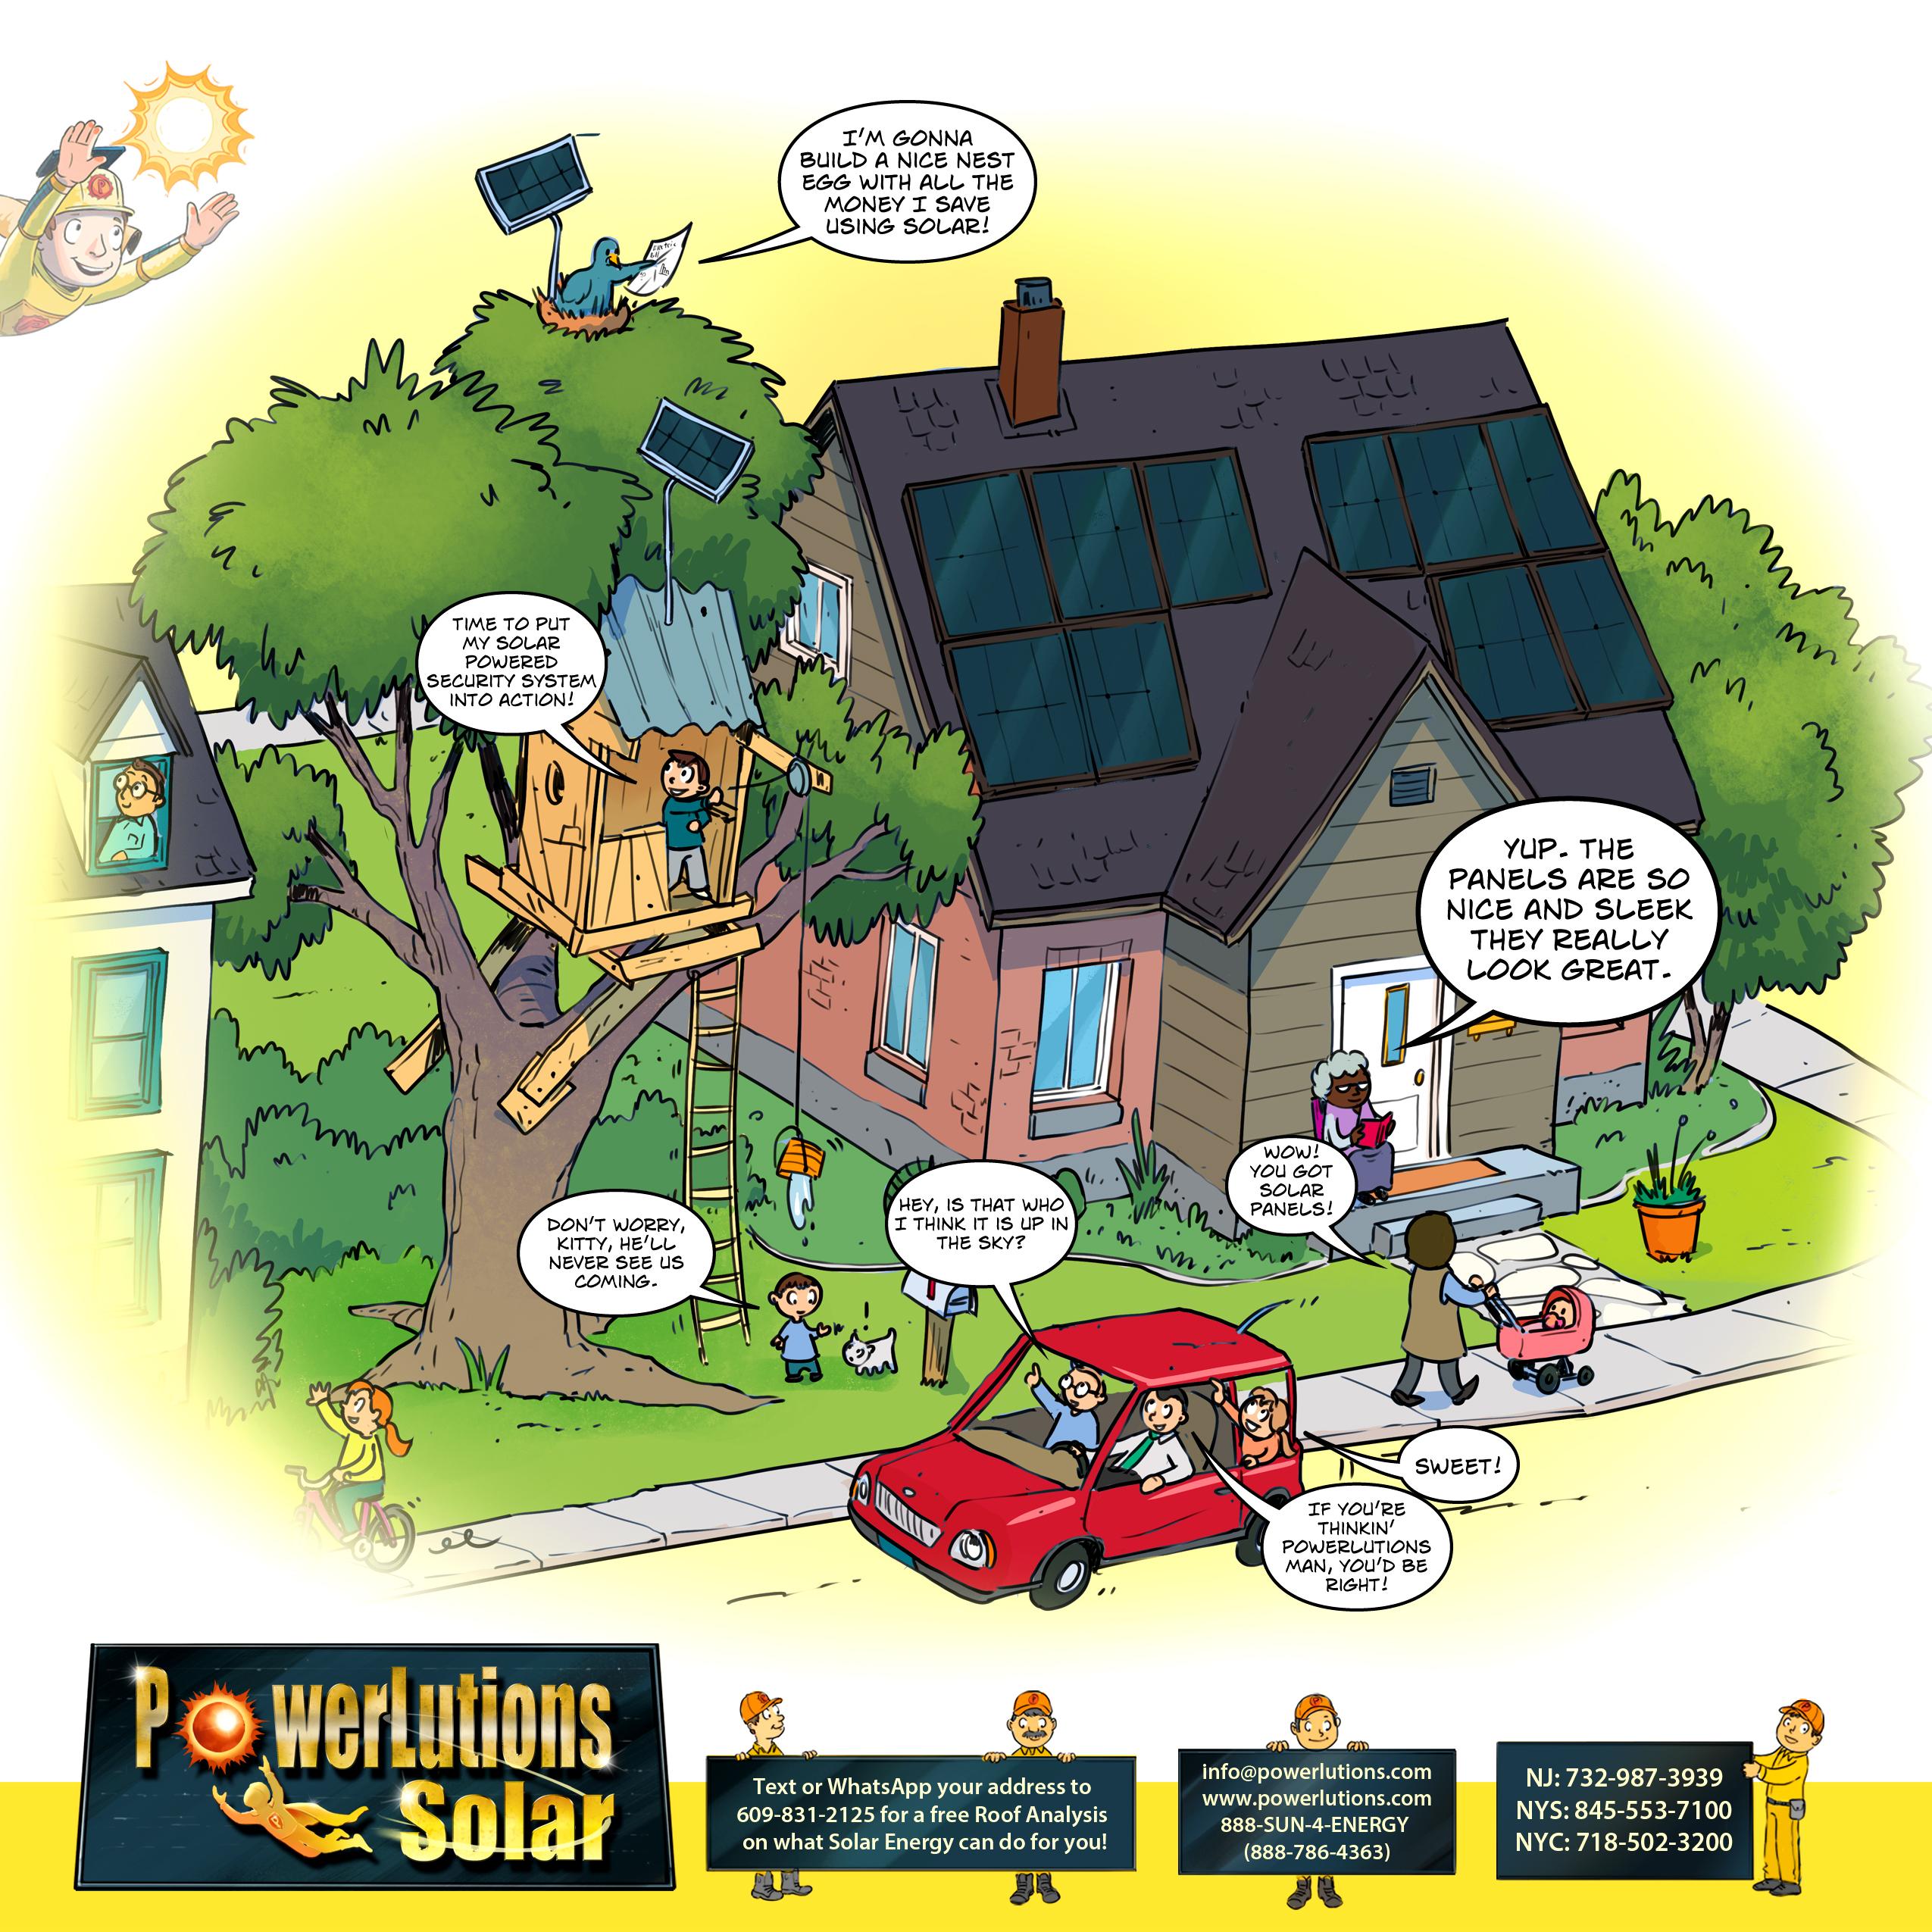 PowerLutions Solar installs good looking solar panel systems.